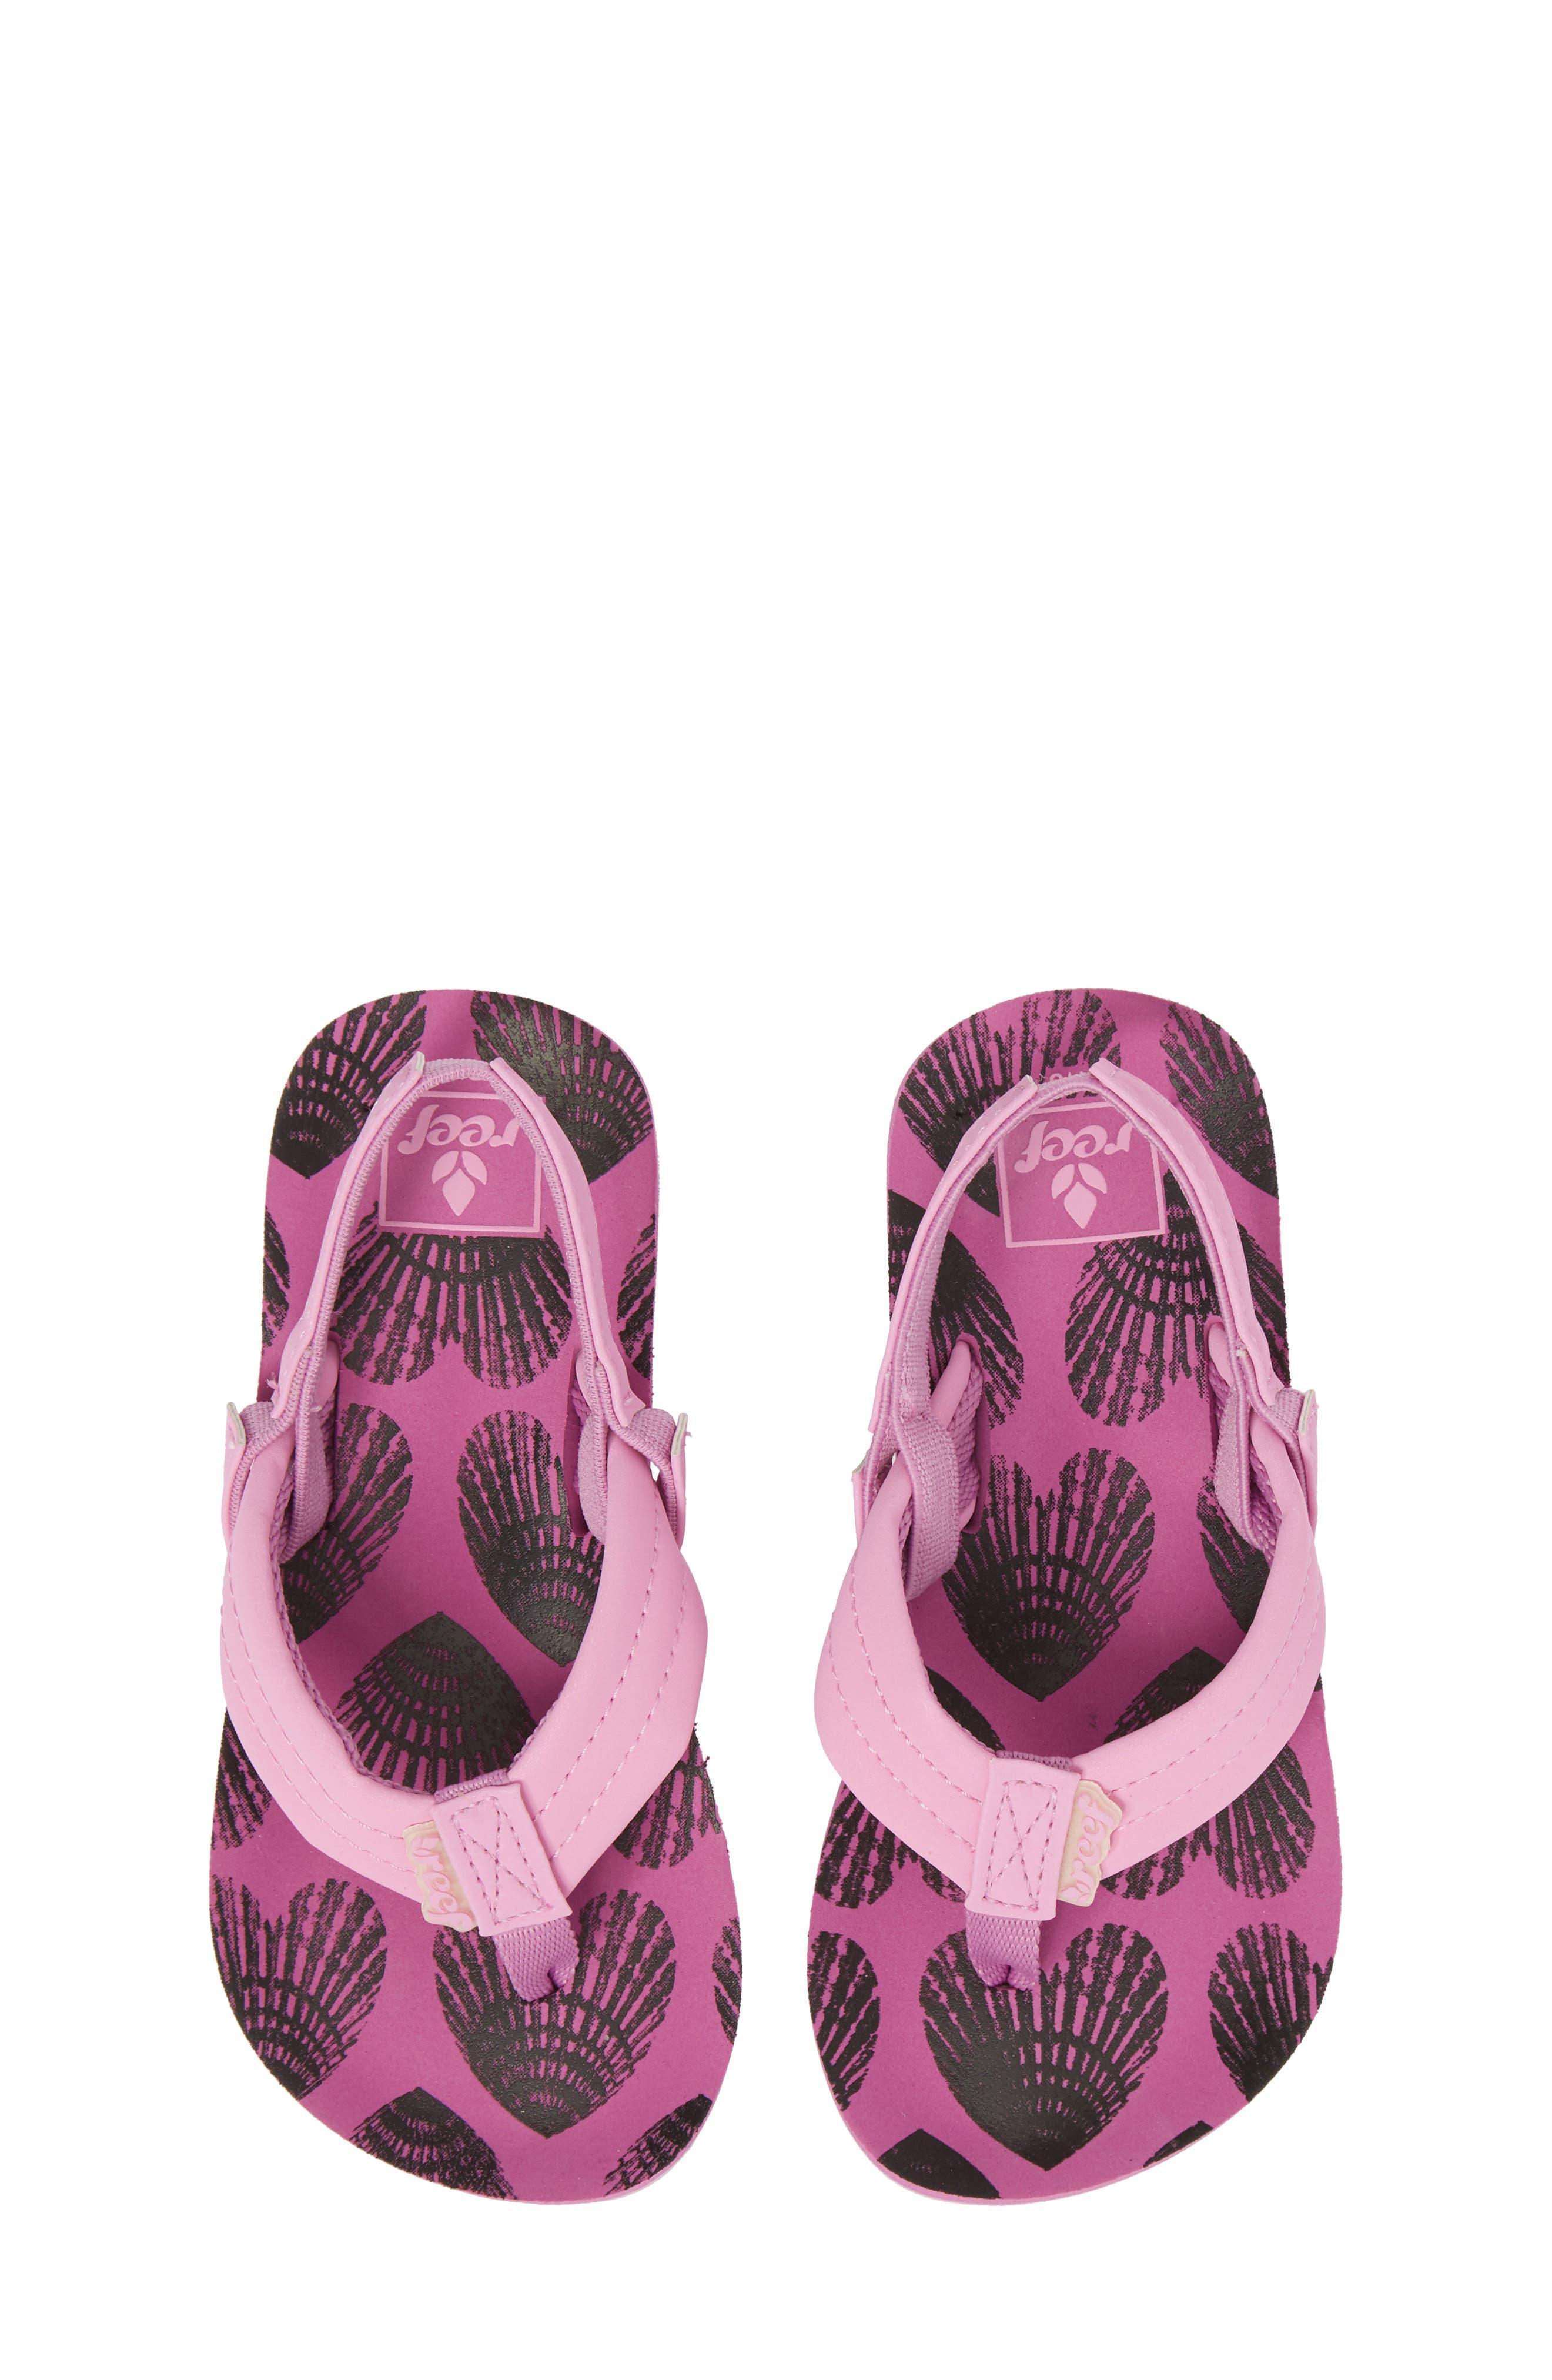 Little Ahi Sandal,                         Main,                         color, Purple